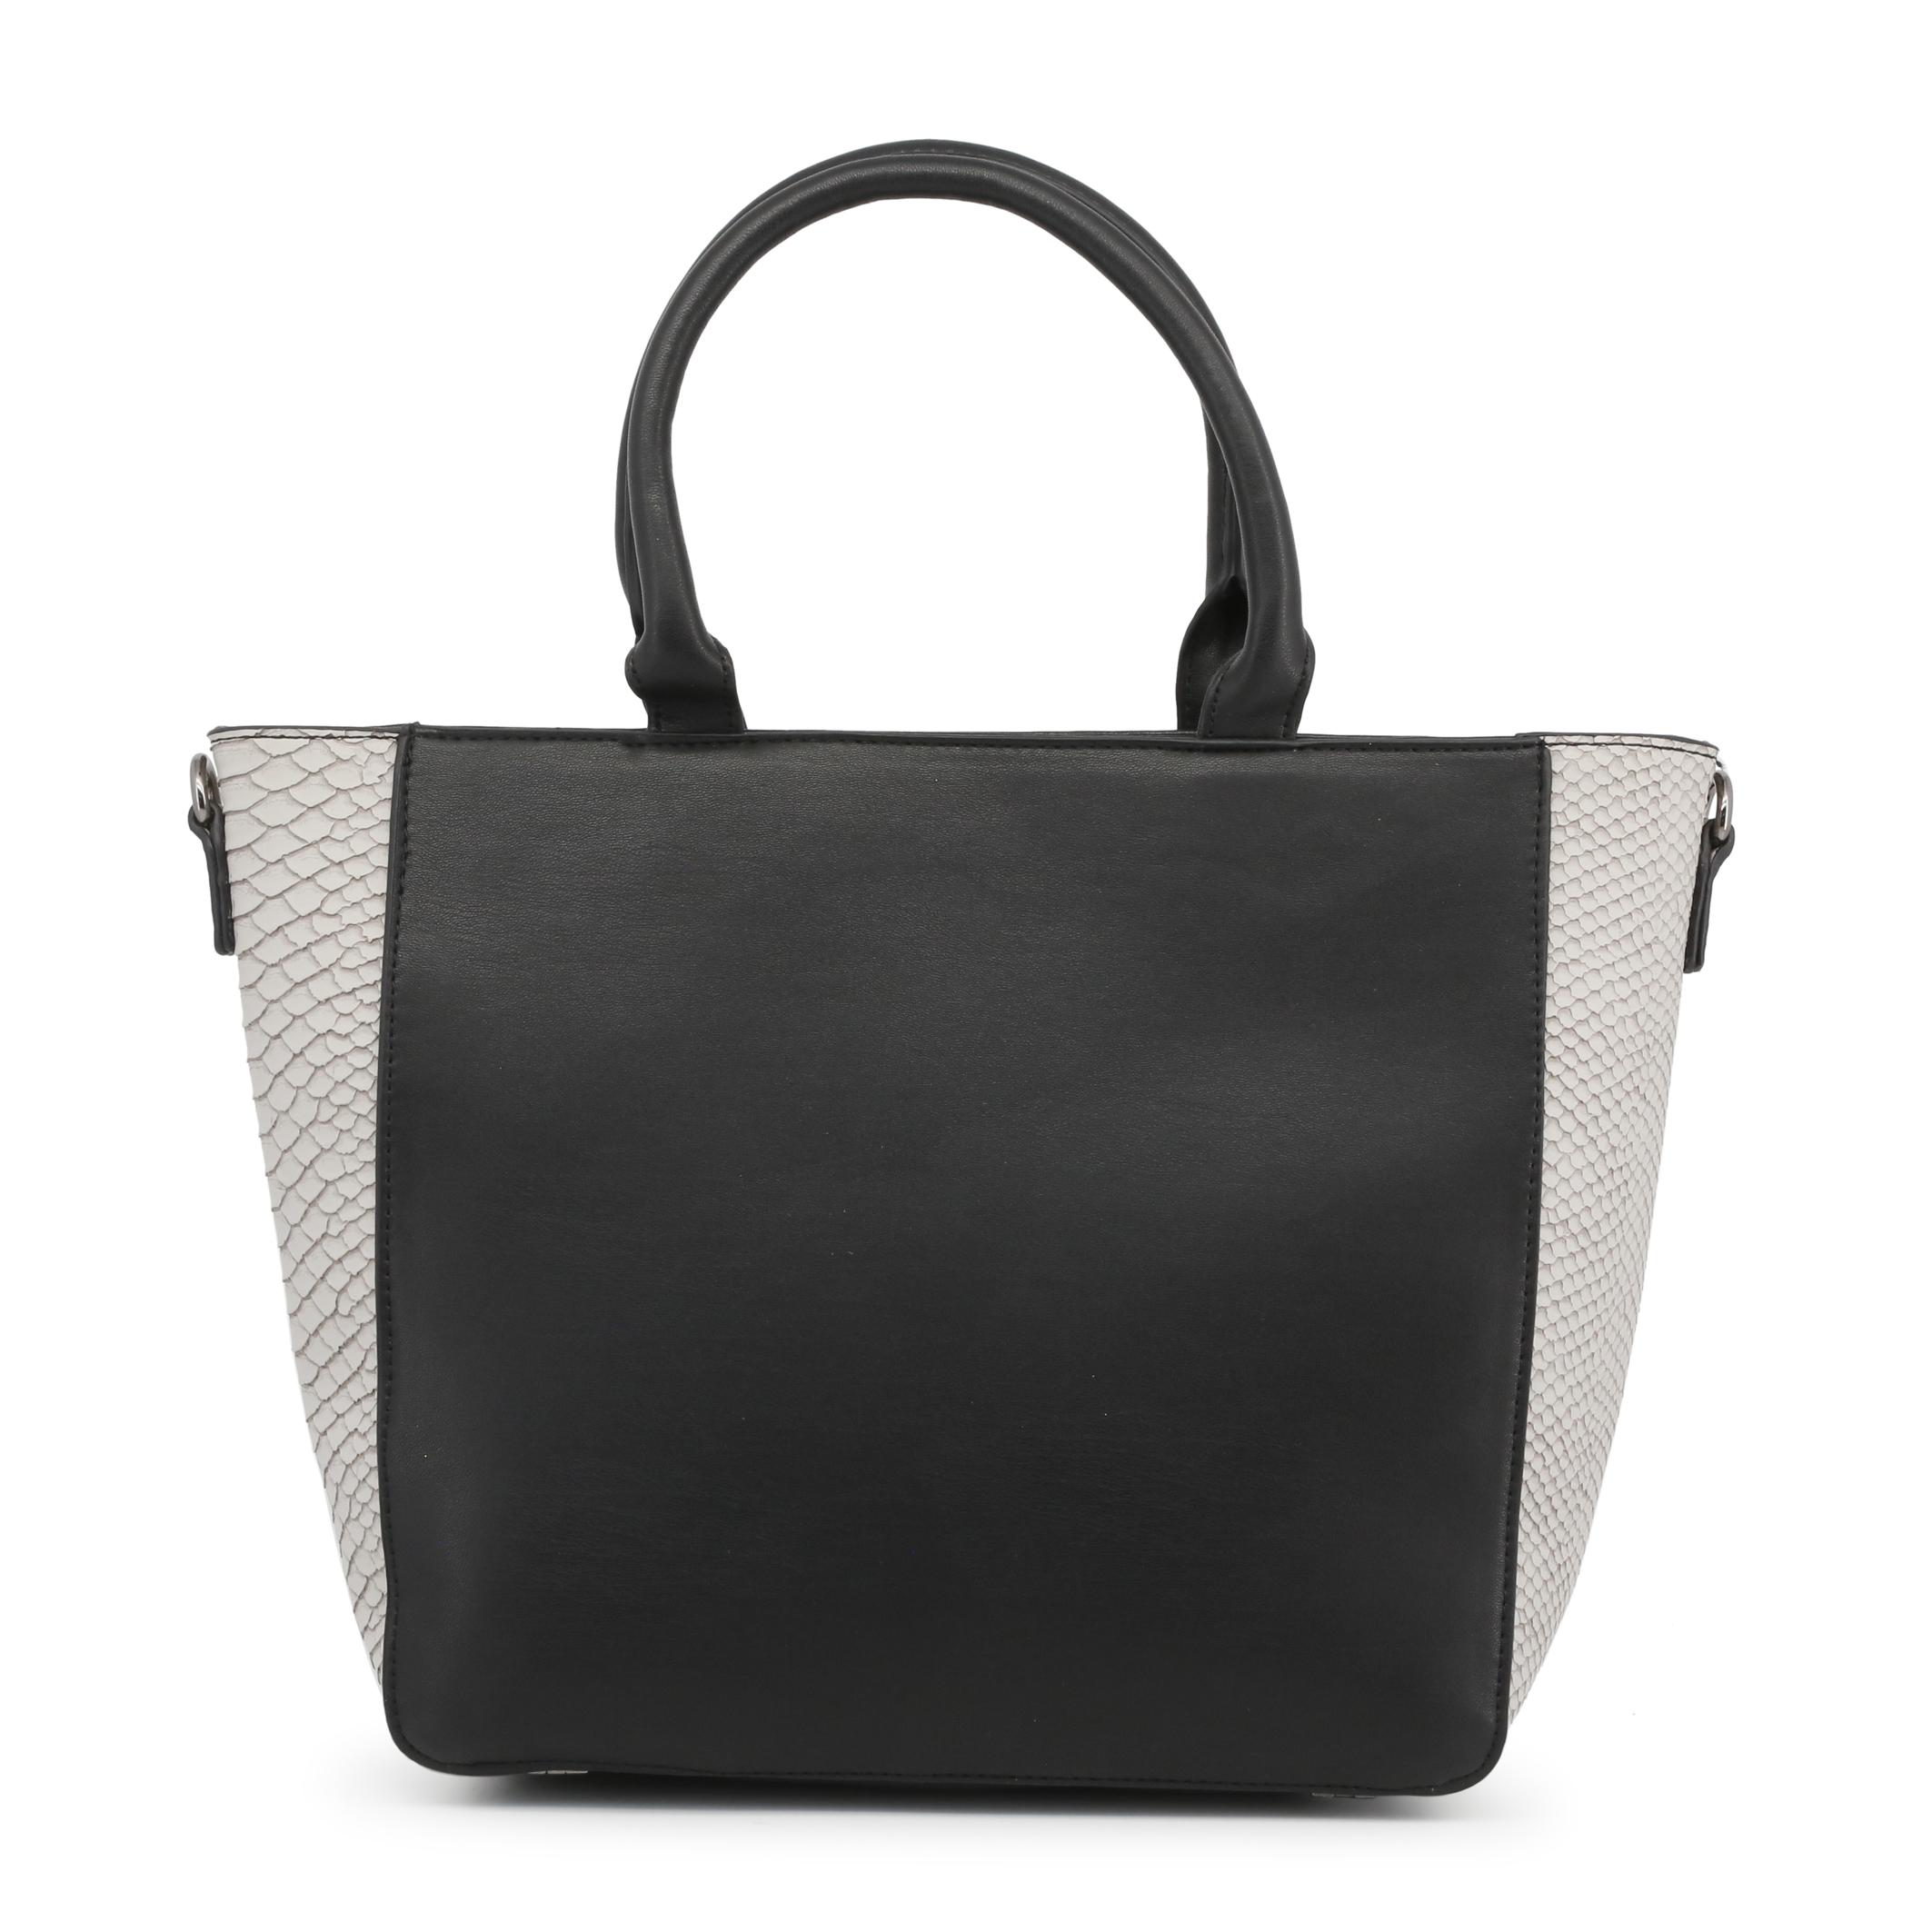 Shopping bag Laura Biagiotti LB18S114-5 Donna Nero 86230